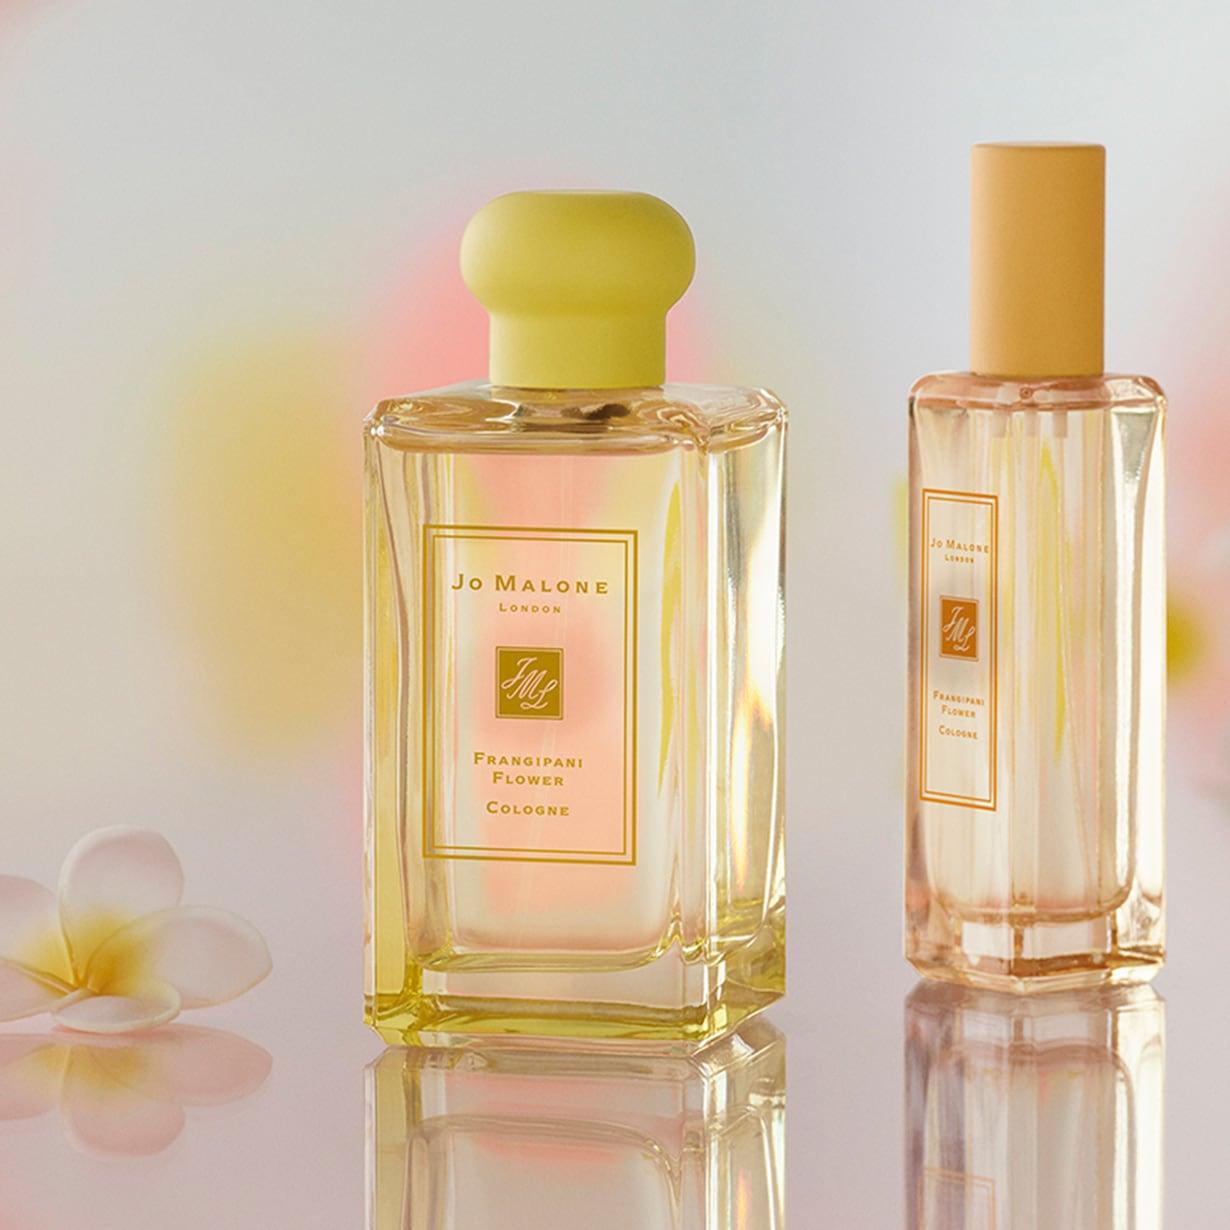 Frangipani Flower Cologne Jo Malone London 香水 - 一款 2019年 新的 中性 香水